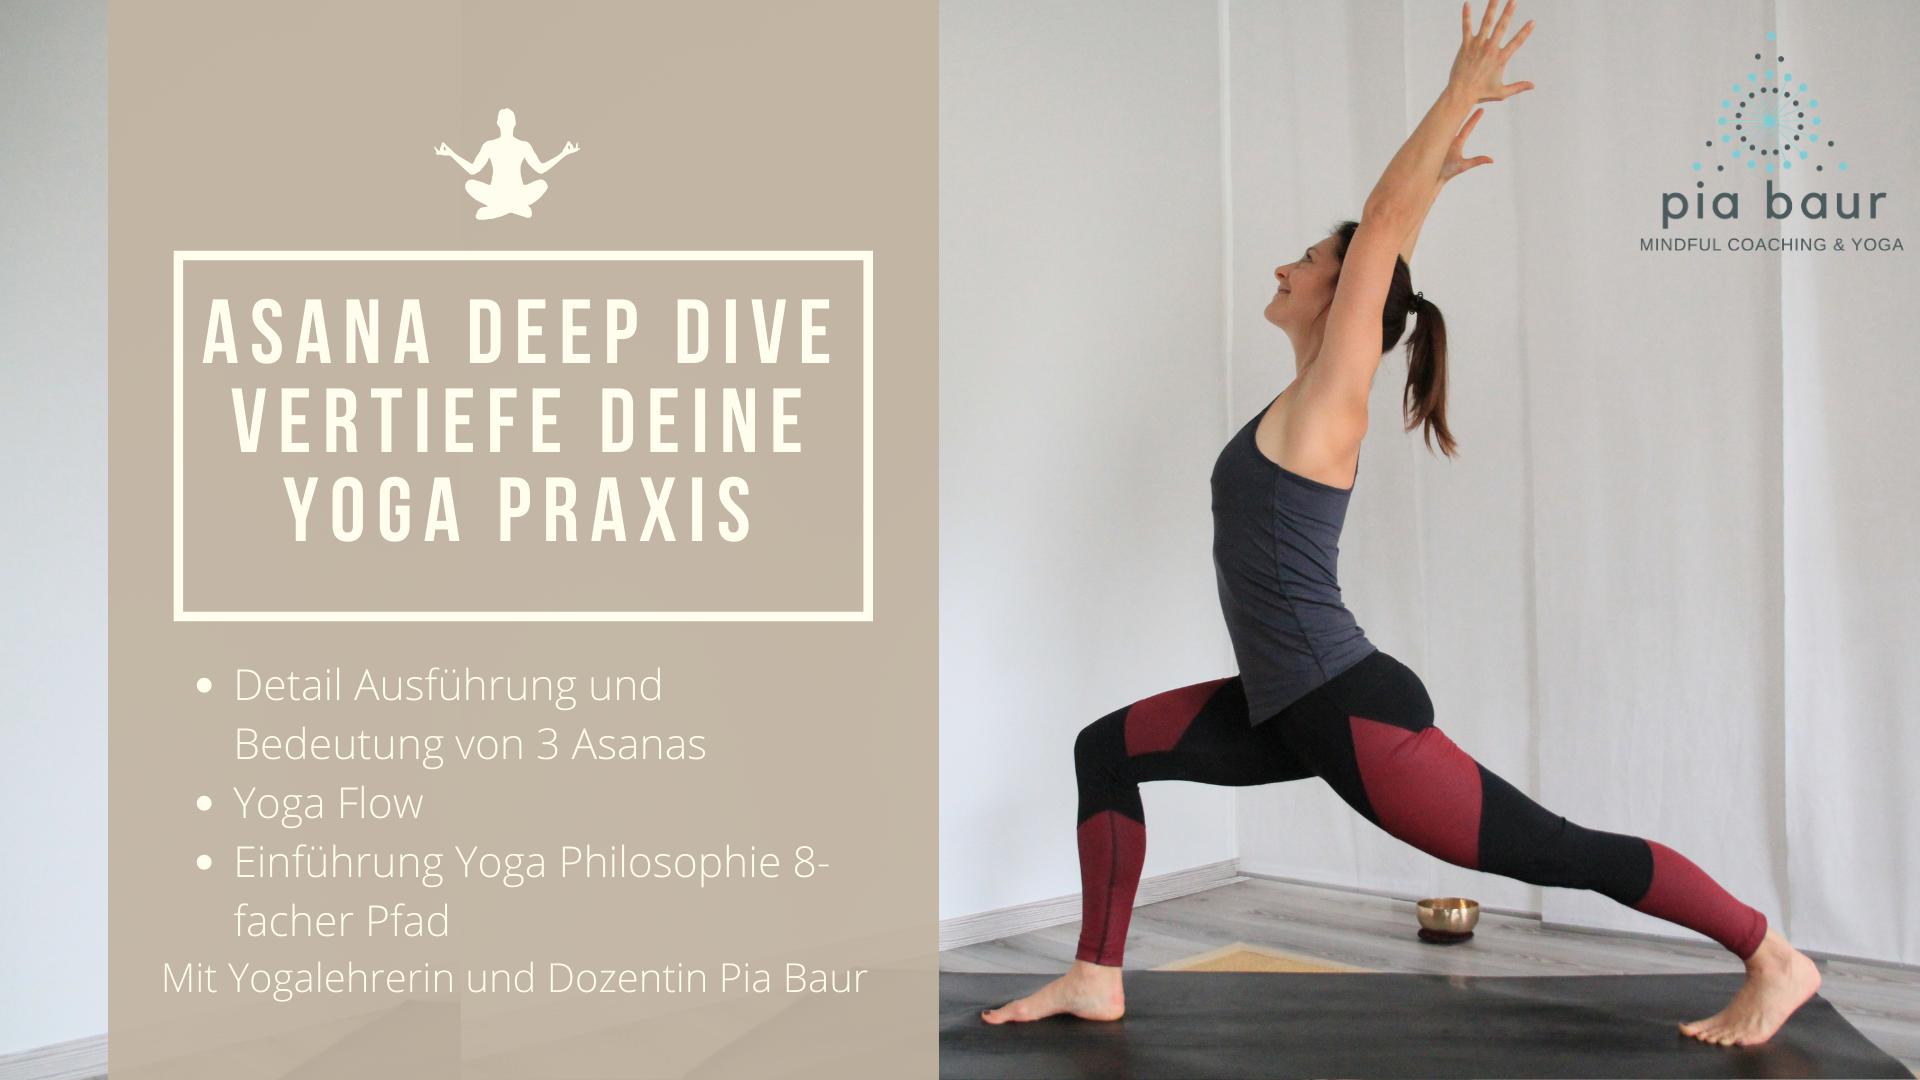 Yoga Workshop München, Pia Baur Yogalehrerin, Yoga Coaching München, Asana Lehre, Yoga Philosophie